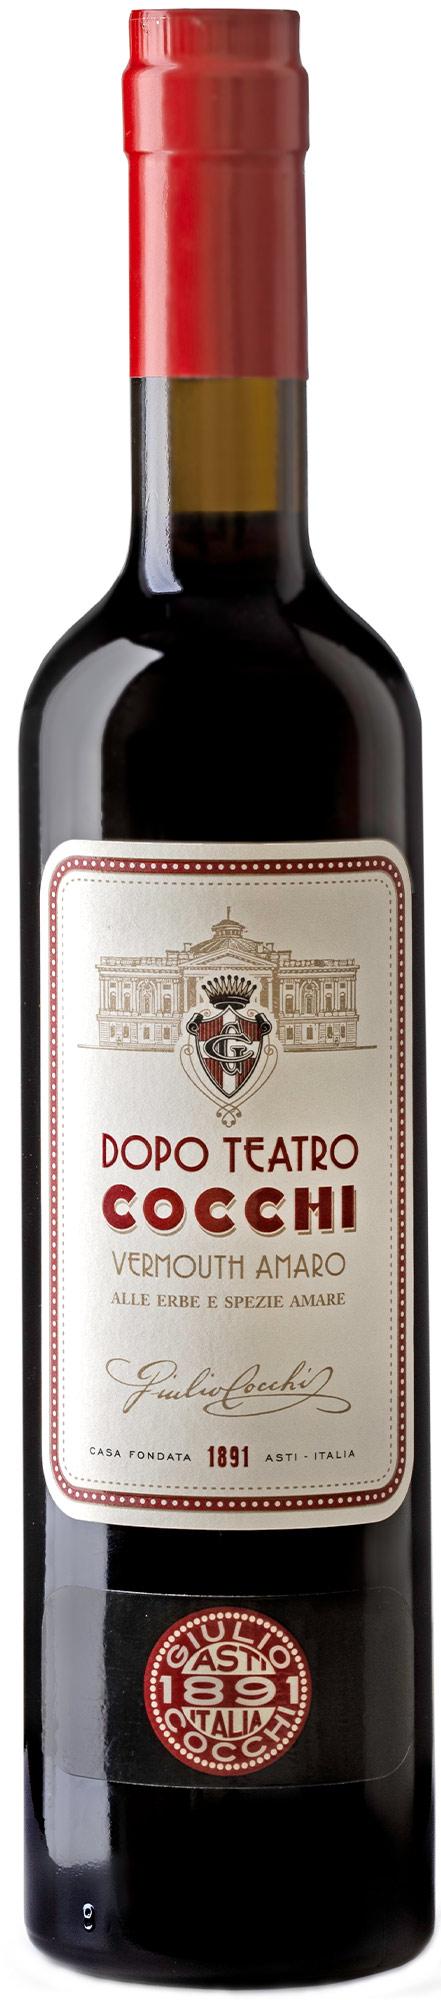 "Cocchi ""Dopo Teatro"" Vermouth Amaro"